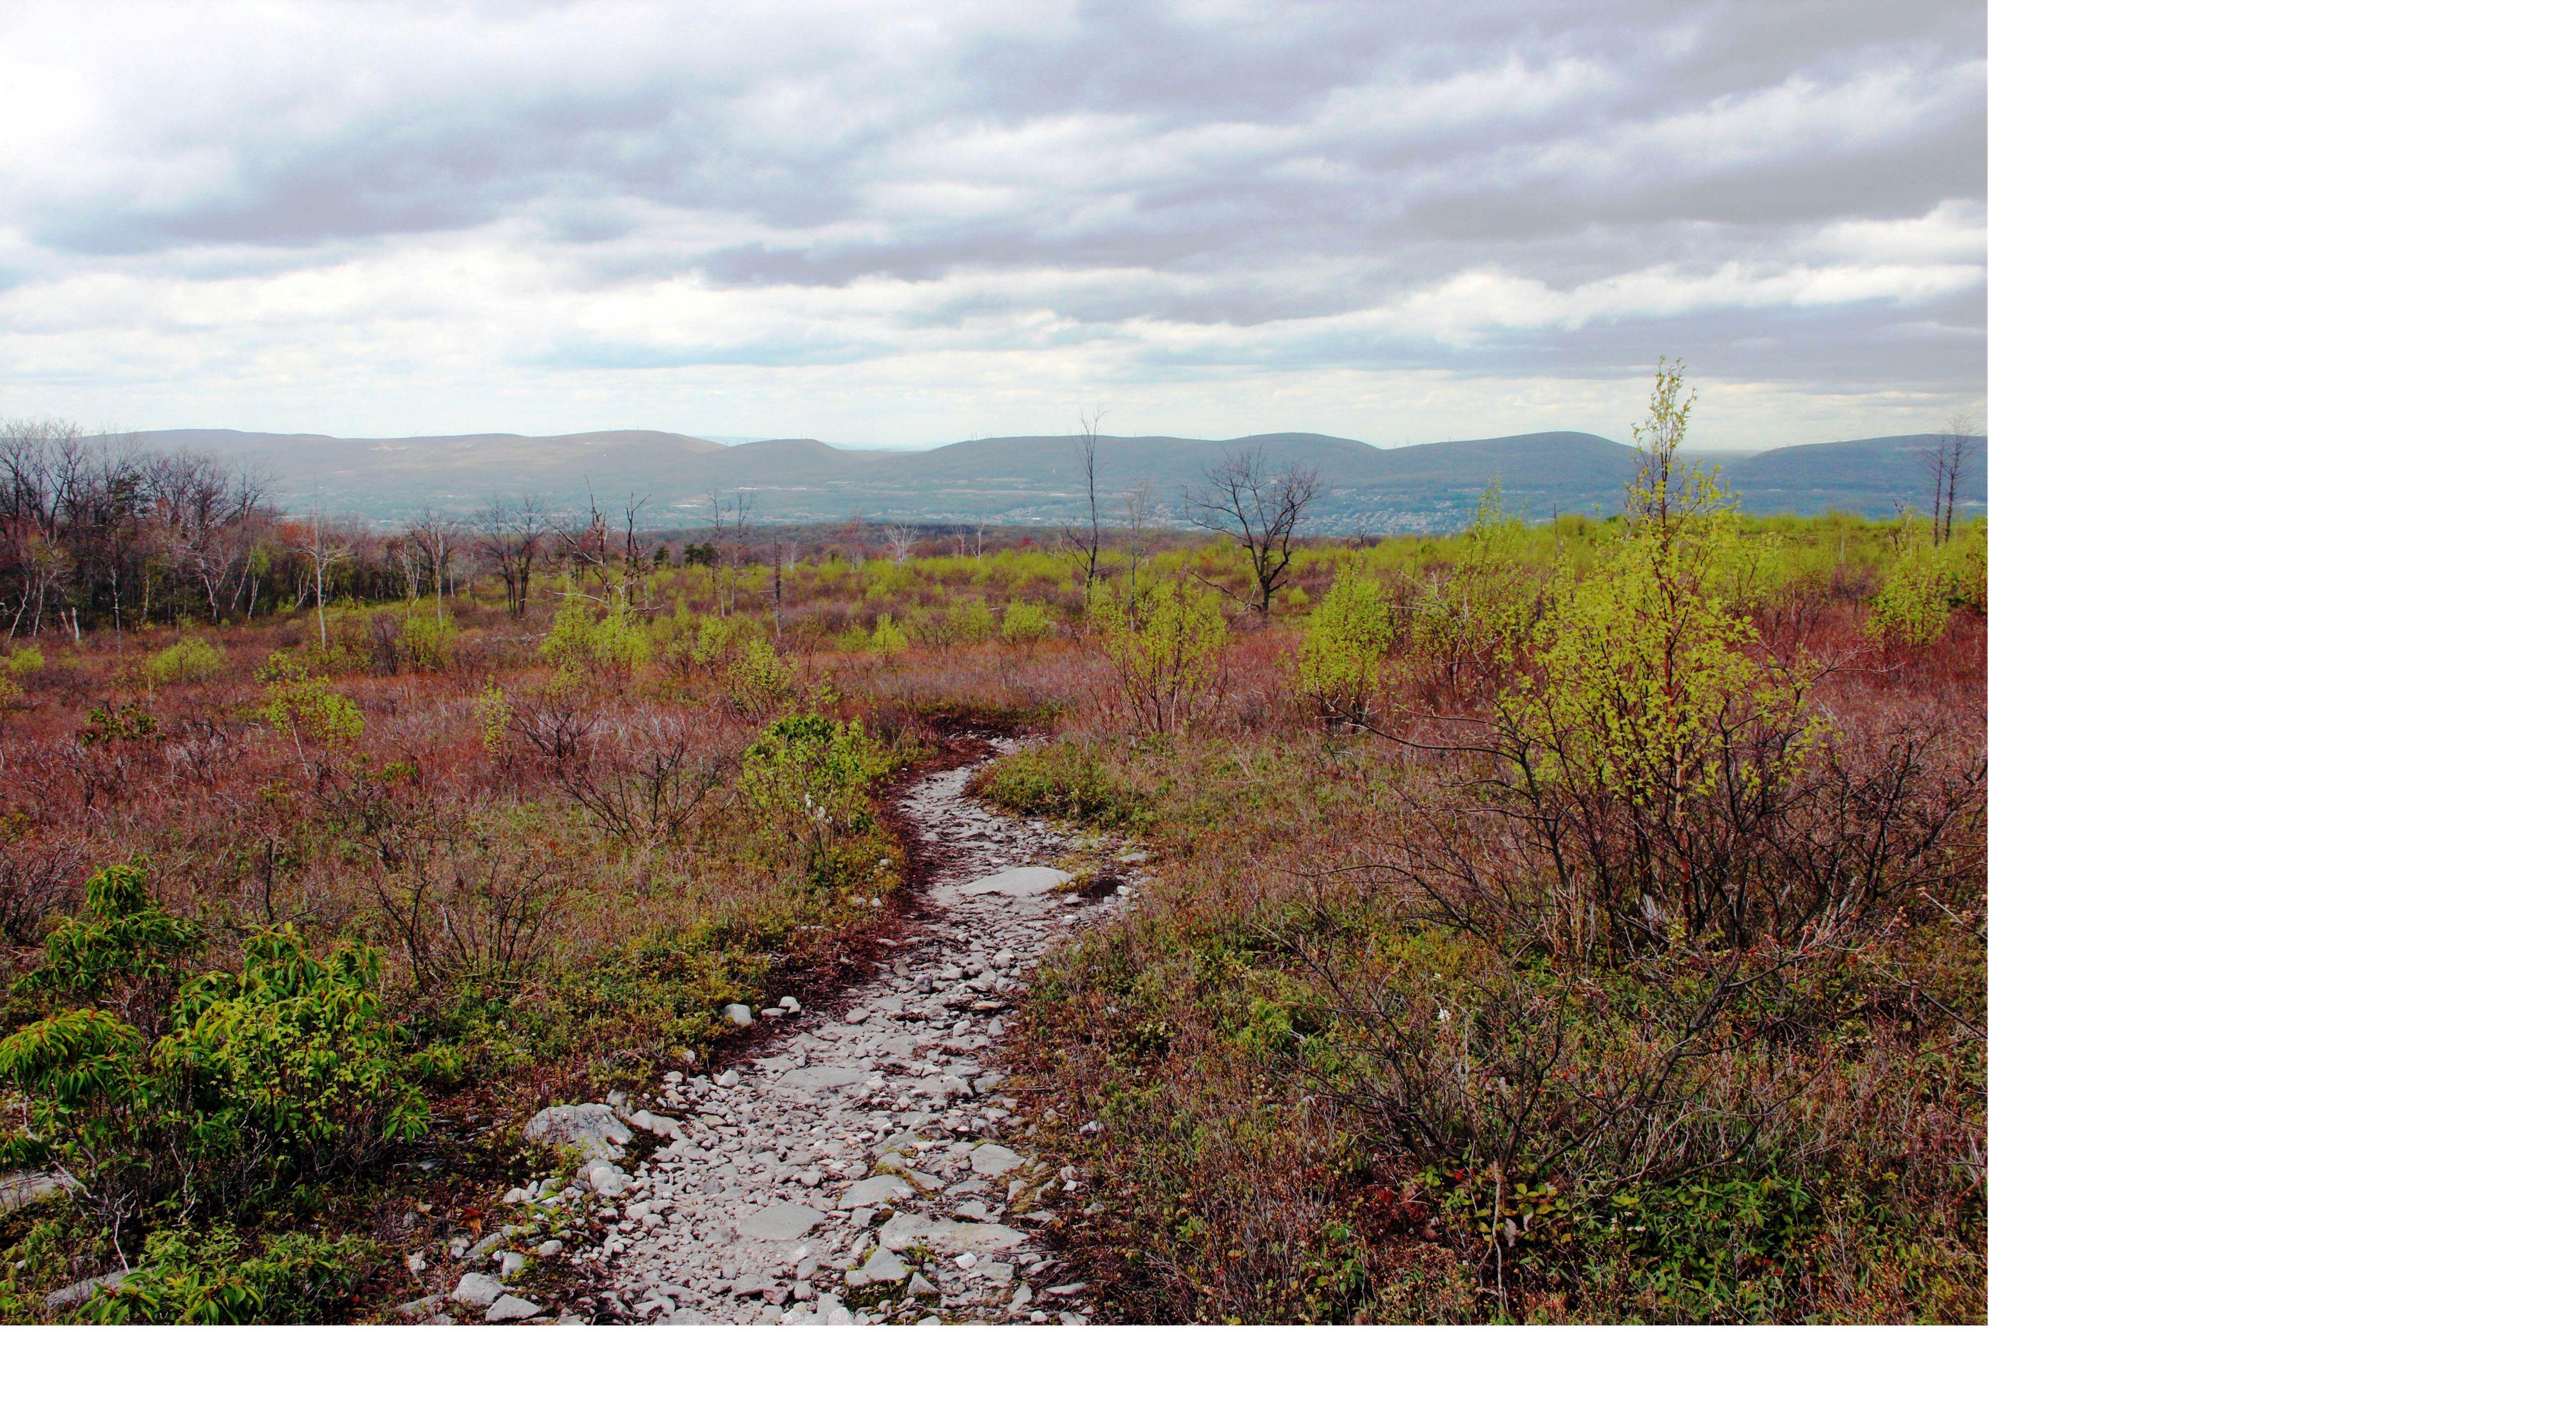 A dirt path leads through a colorful barrens landscape.